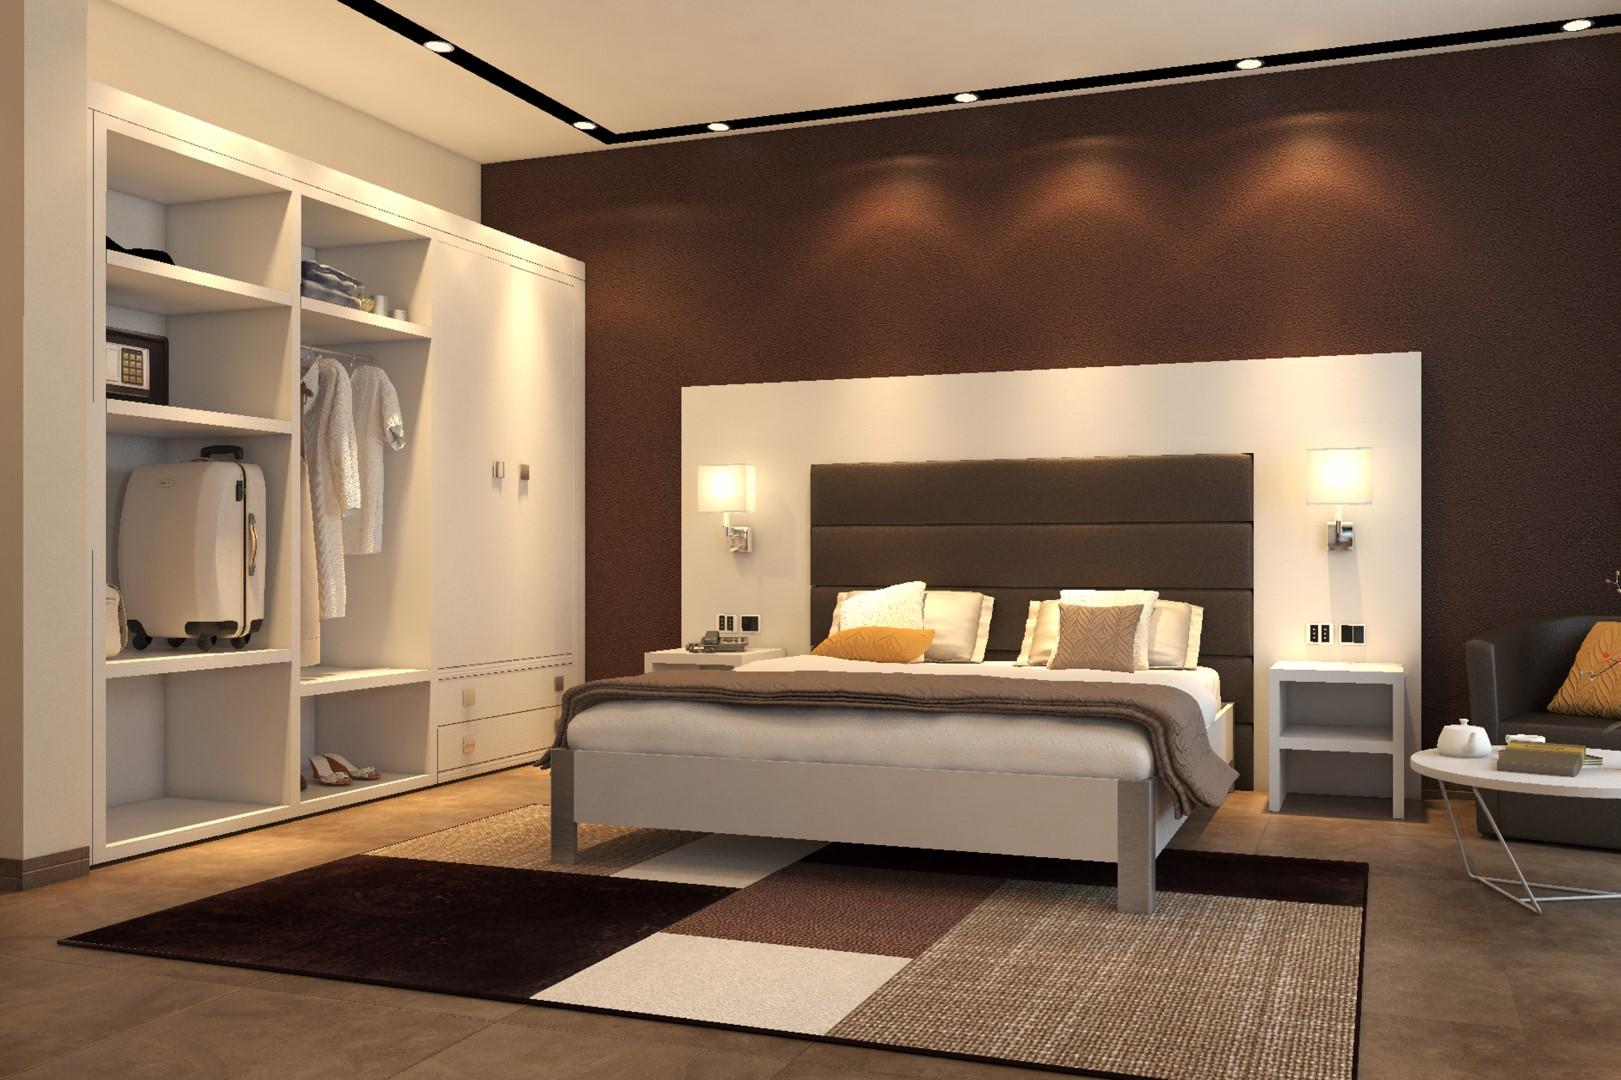 furniture_0014_2.double room_hotel furniture (9)